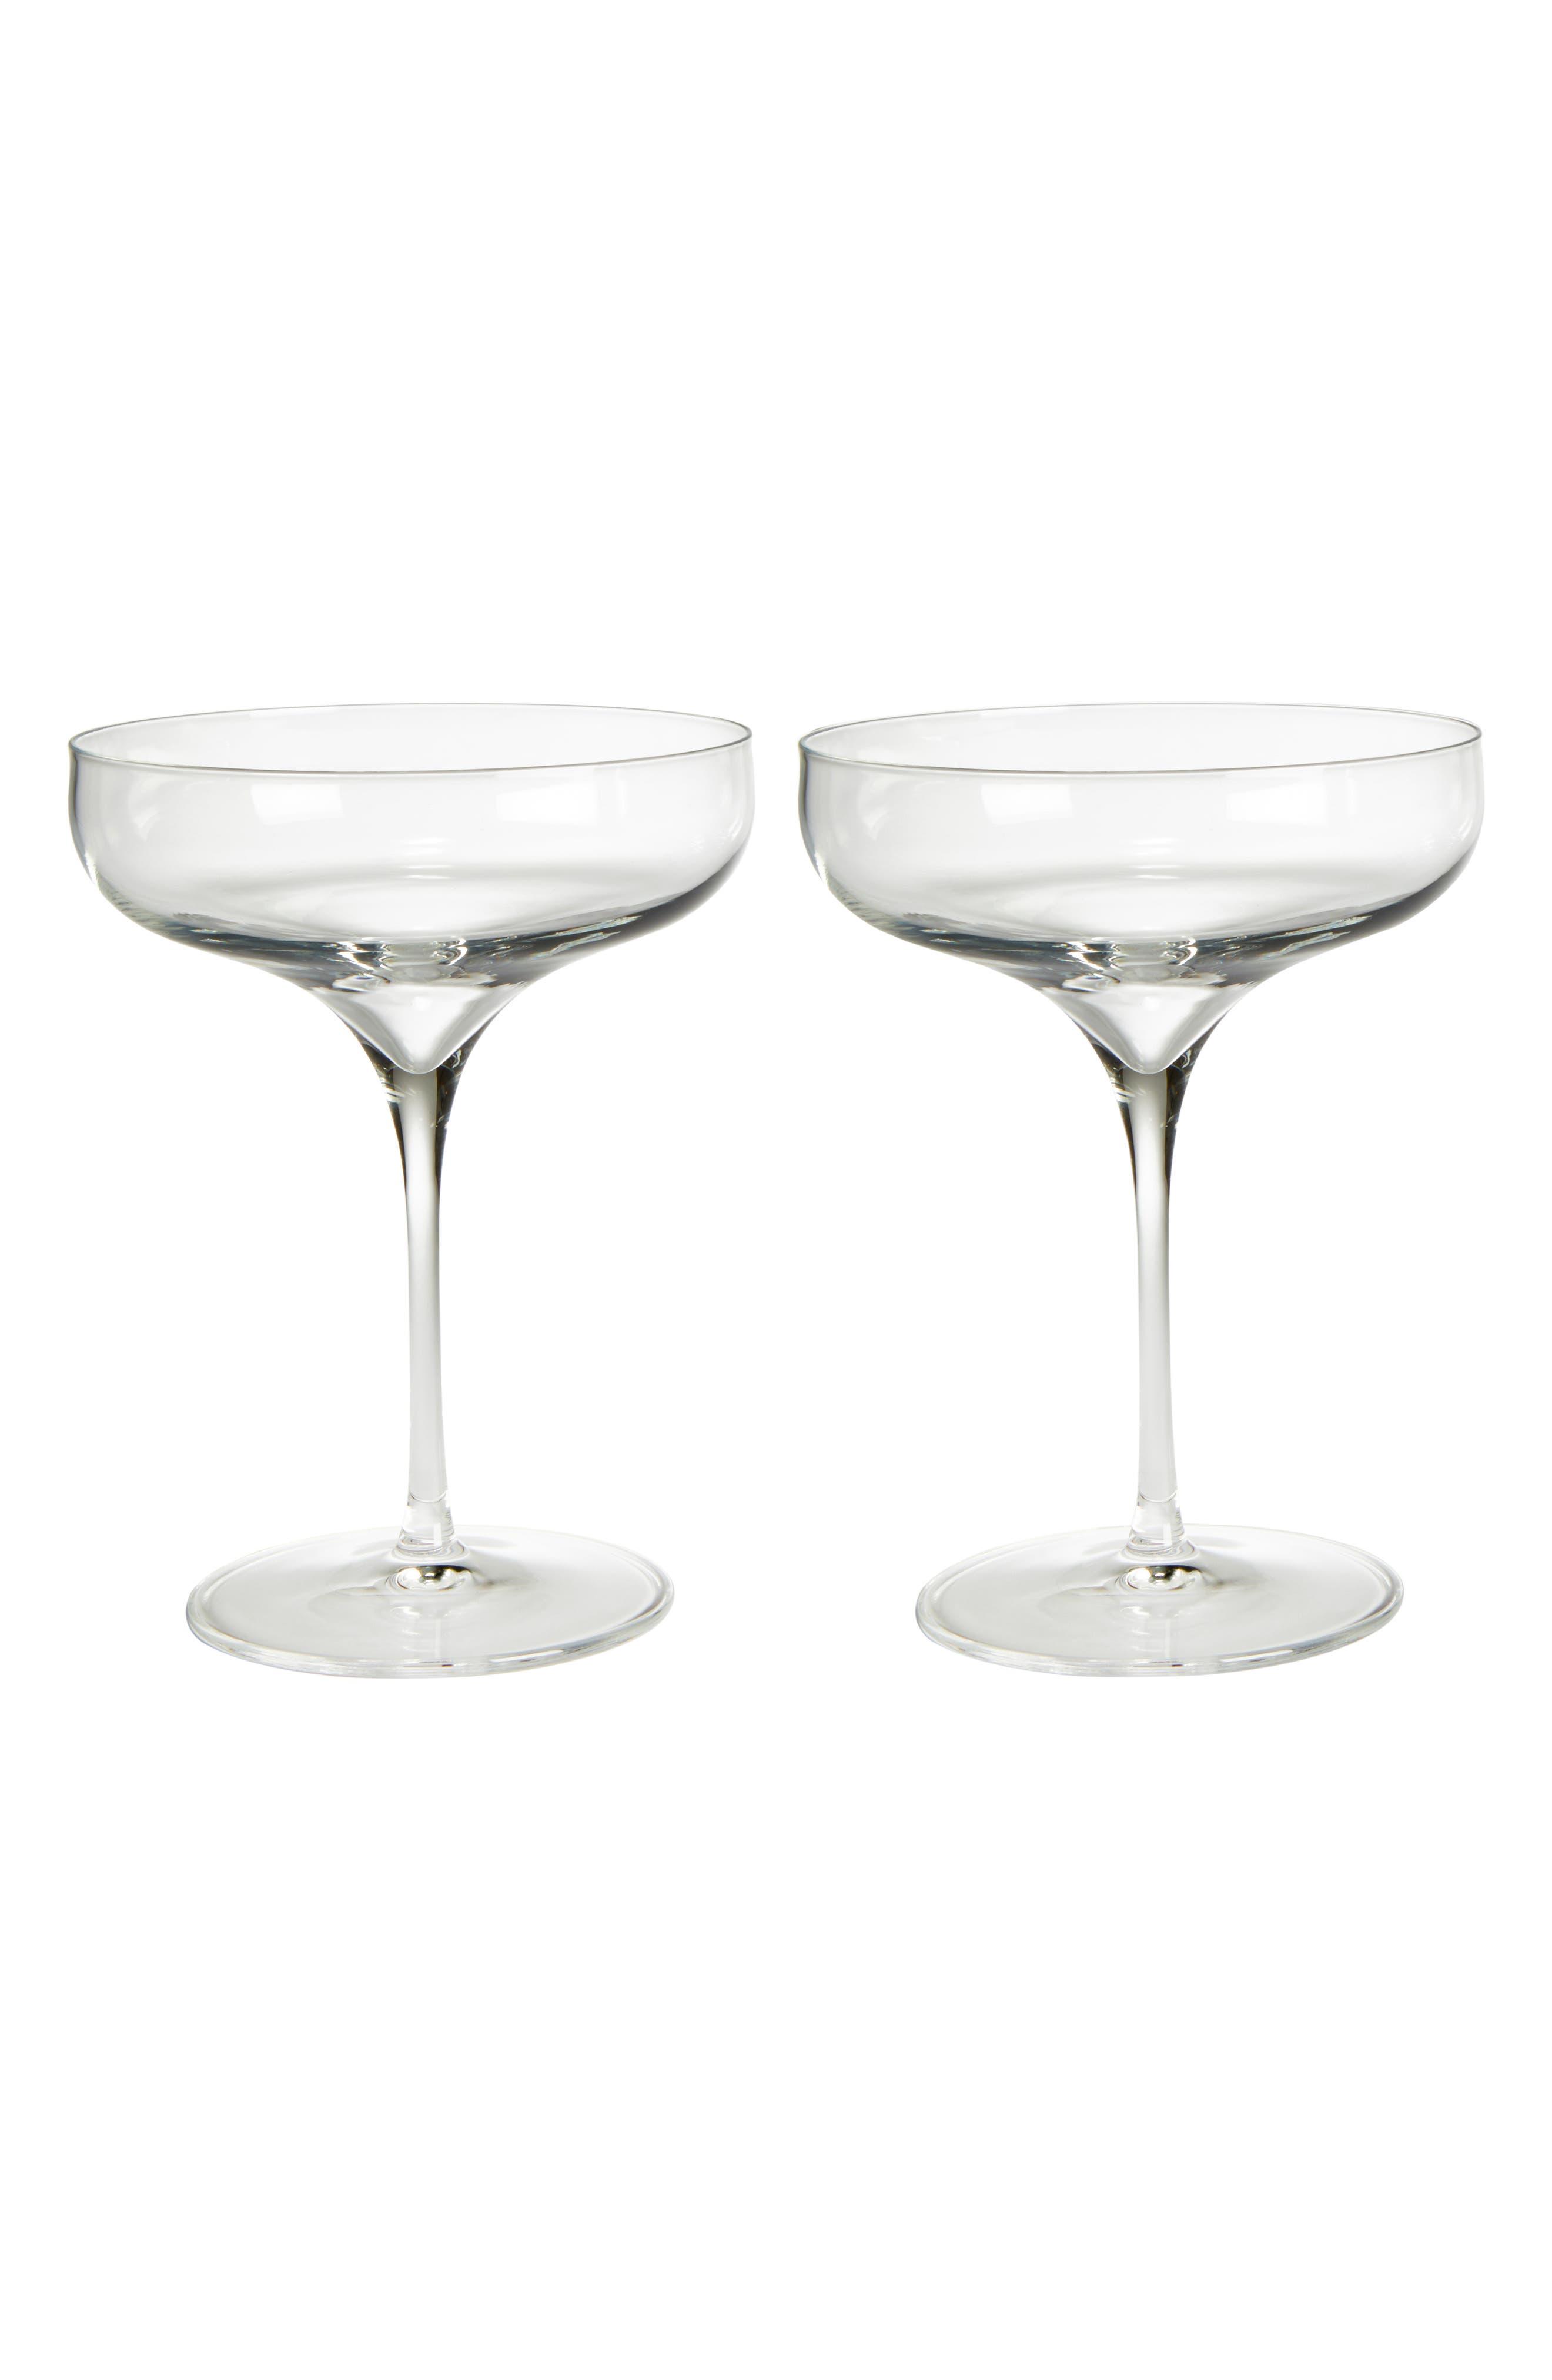 Luigi Bormiolo Vinea Moscato/Spumante Set of 2 Coupe Glasses,                             Main thumbnail 1, color,                             100